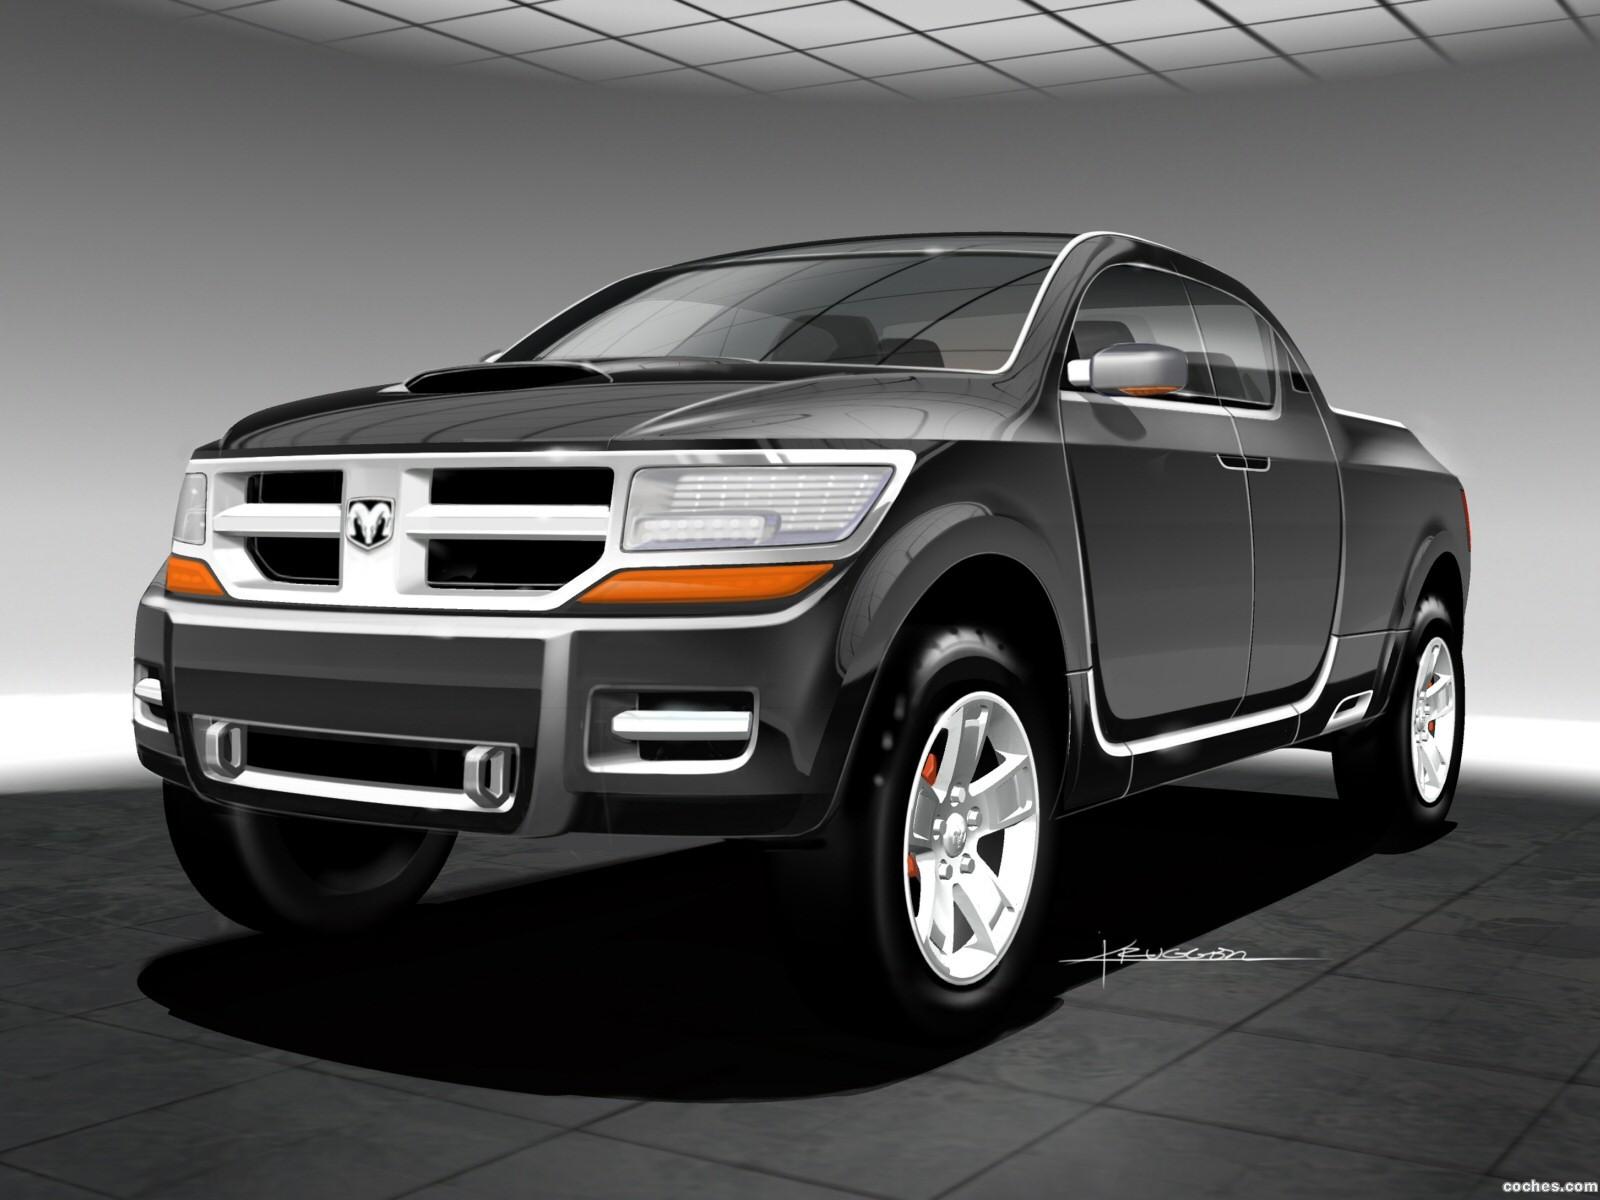 Foto 0 de Dodge Rampage Concept 2006